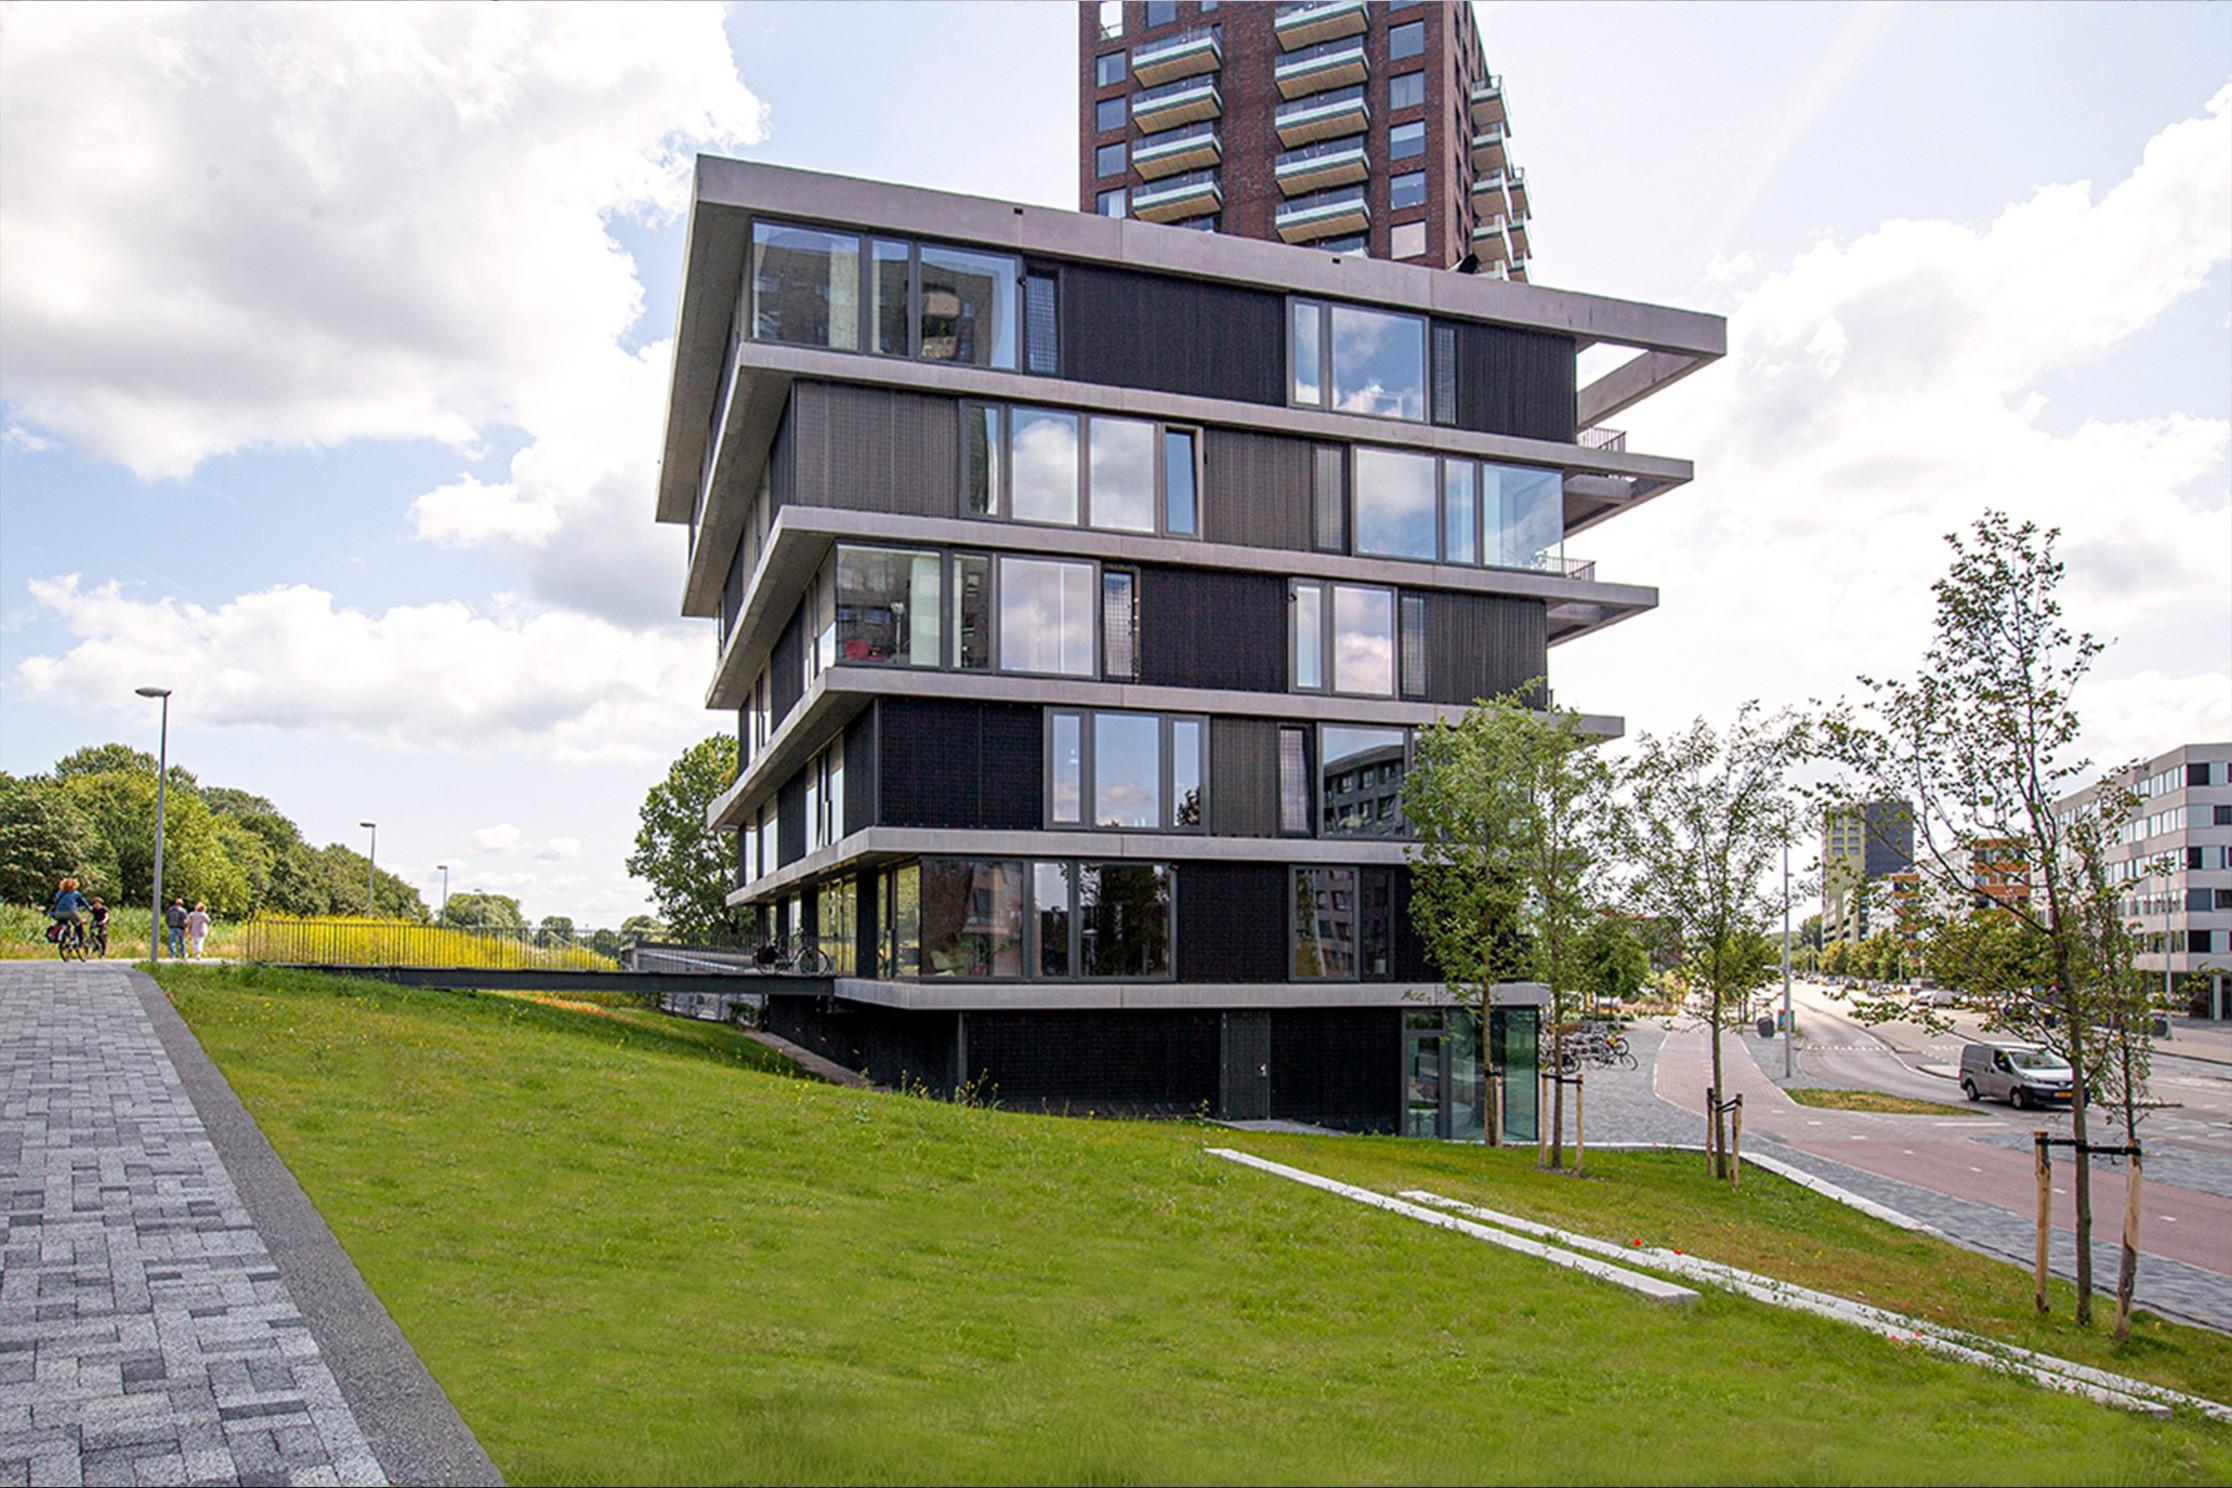 CPO Science Park Amsterdam